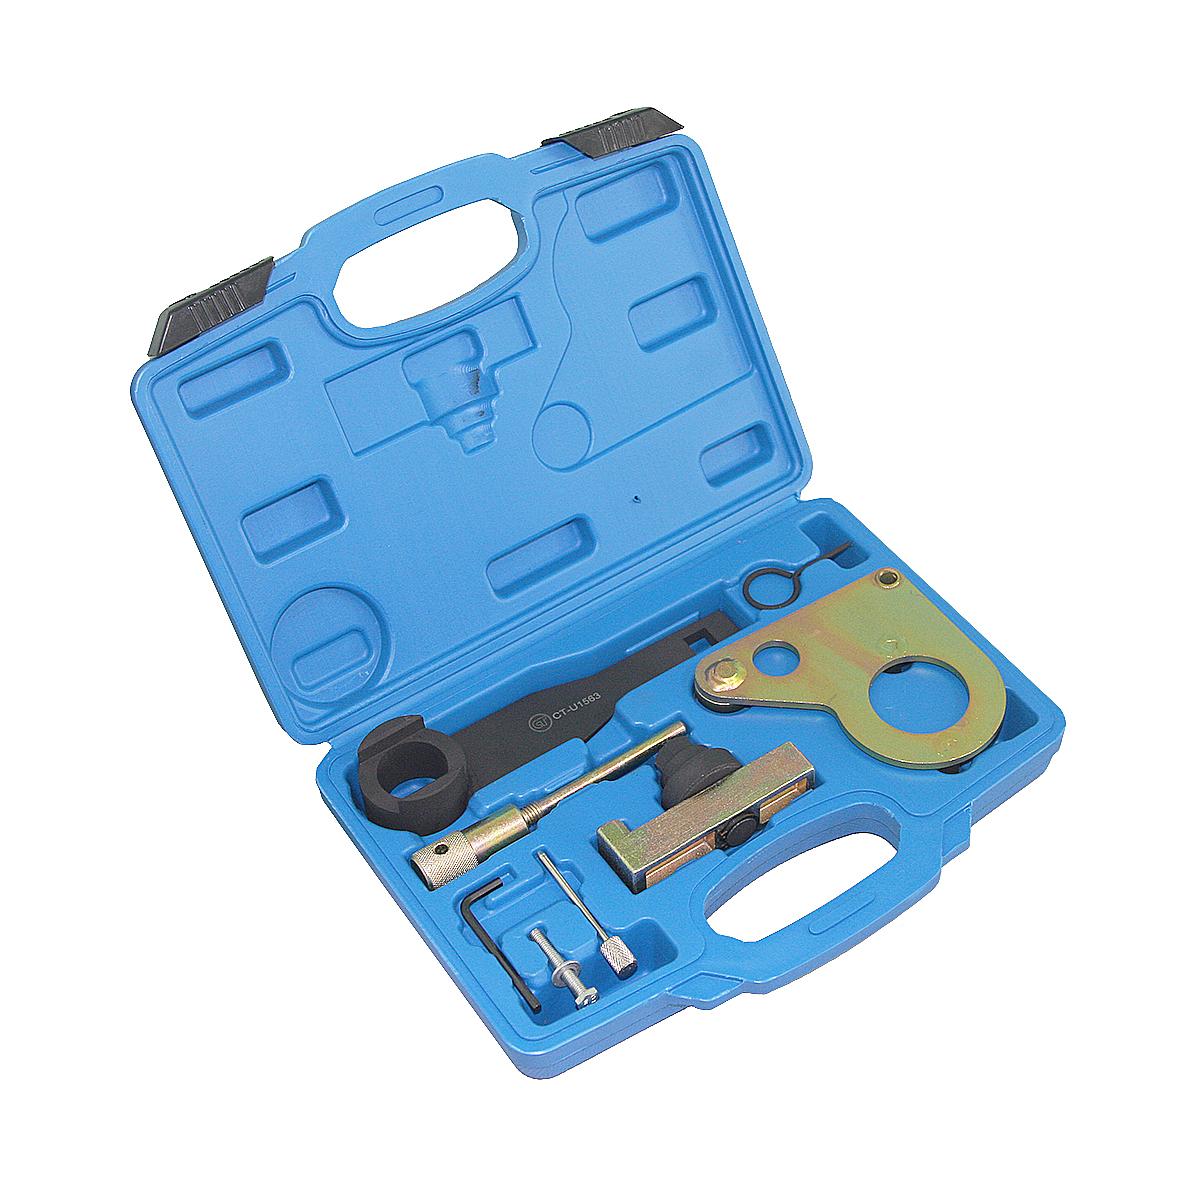 Набор для установки фаз ГРМ Renault 2.0 DCI Car-Tool CT-1563